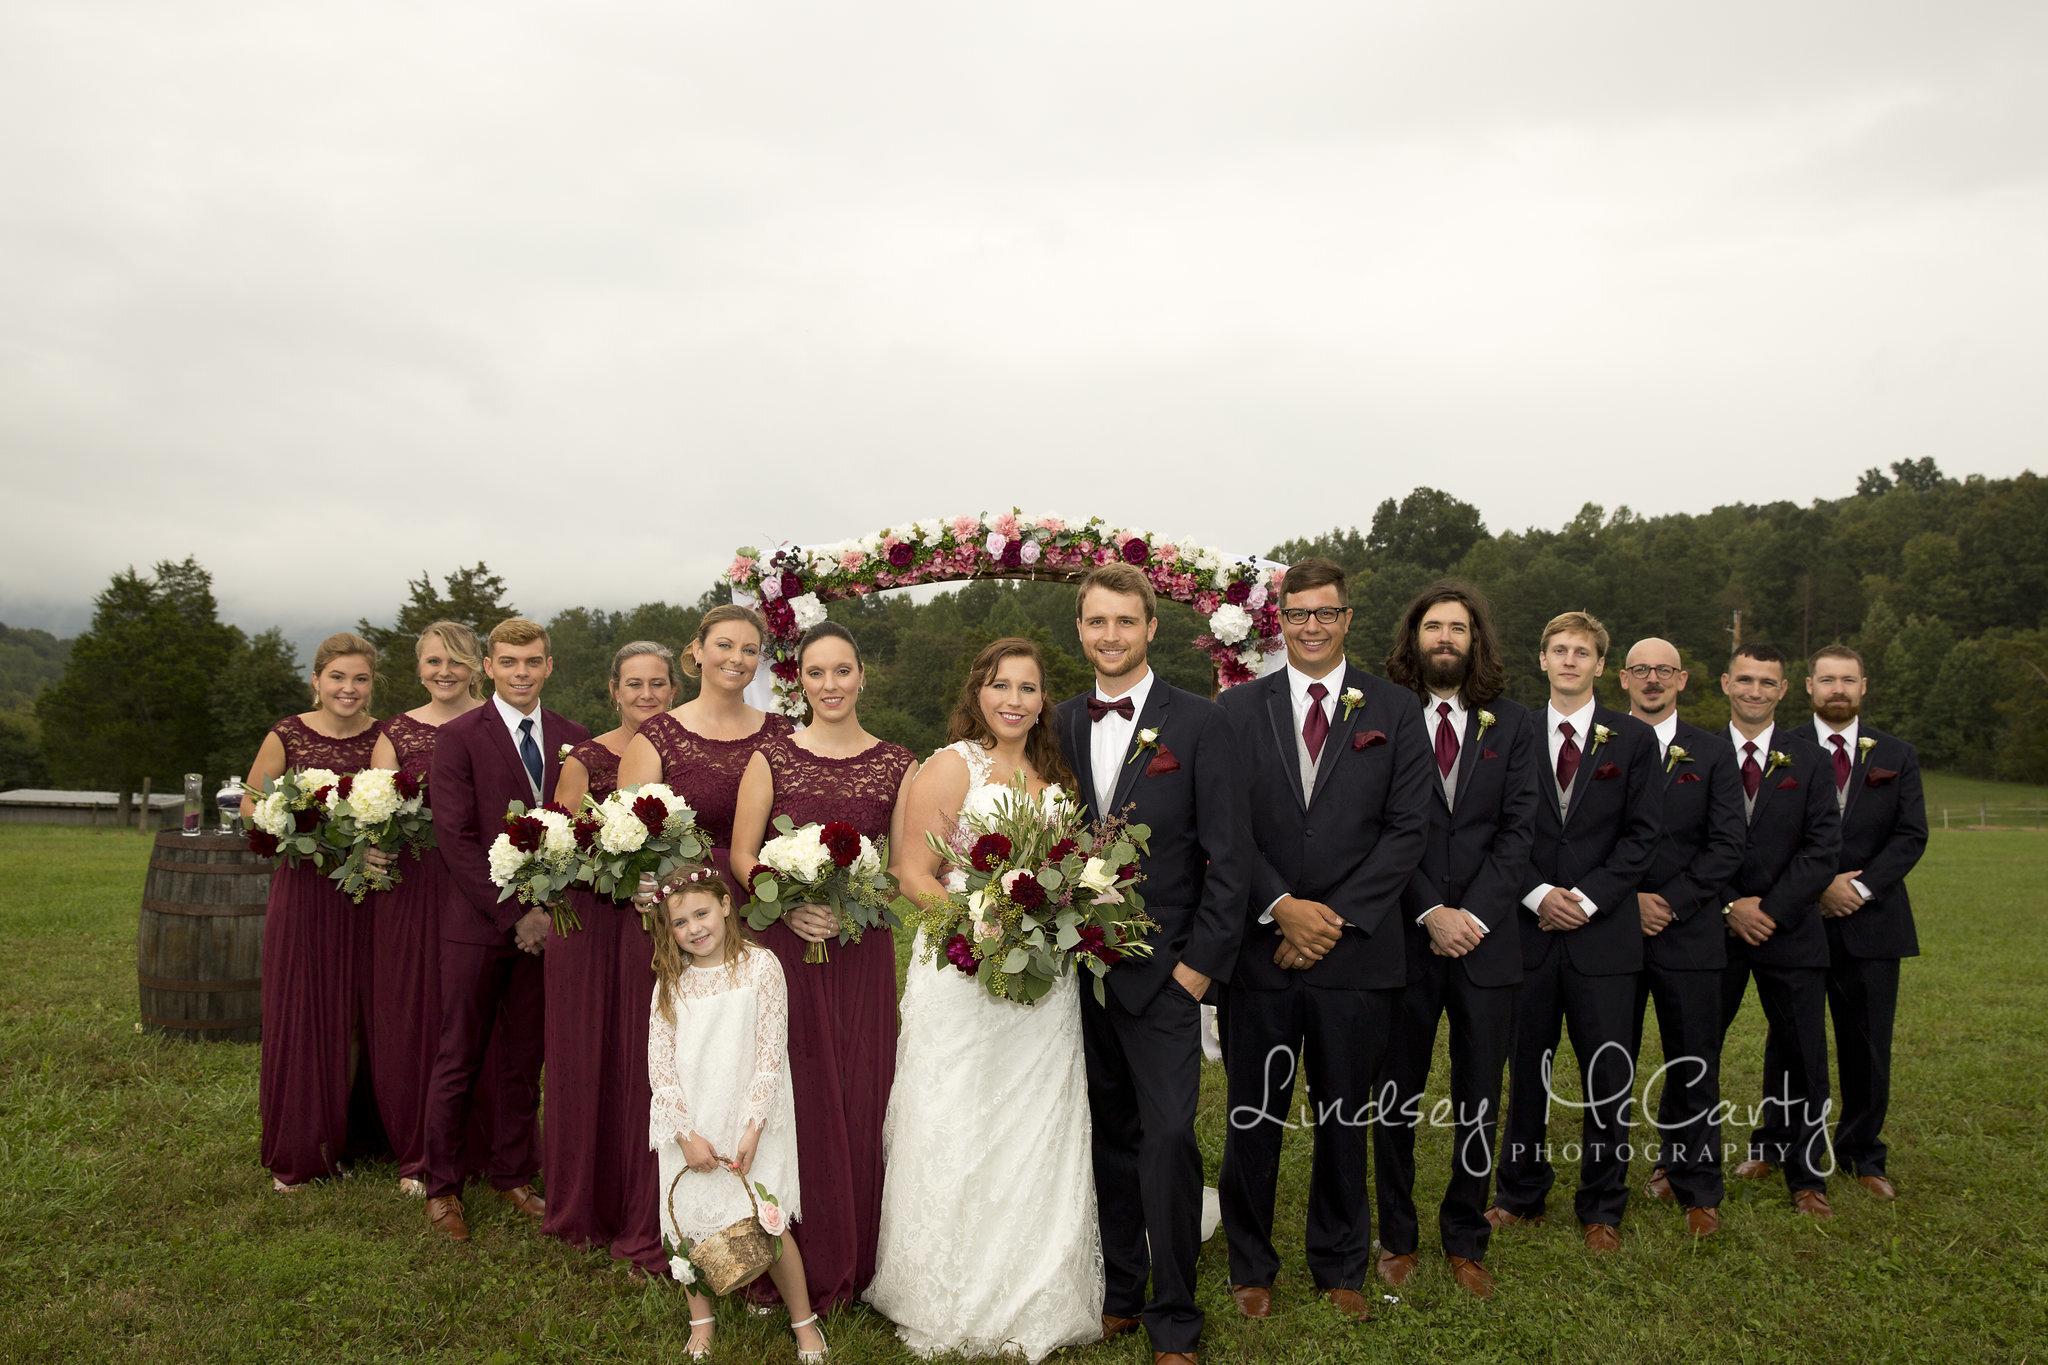 Jess + Bryc's Wedding at Whistle Hollow Farm in Fairfield, VA | Wedding at Whistle Hollow Farm in Fairfield, VA | Wedding Photography at Whistle Hollow Farm in Fairfield, VA | Lindsey McCarty Photography - Virginia wedding photographer